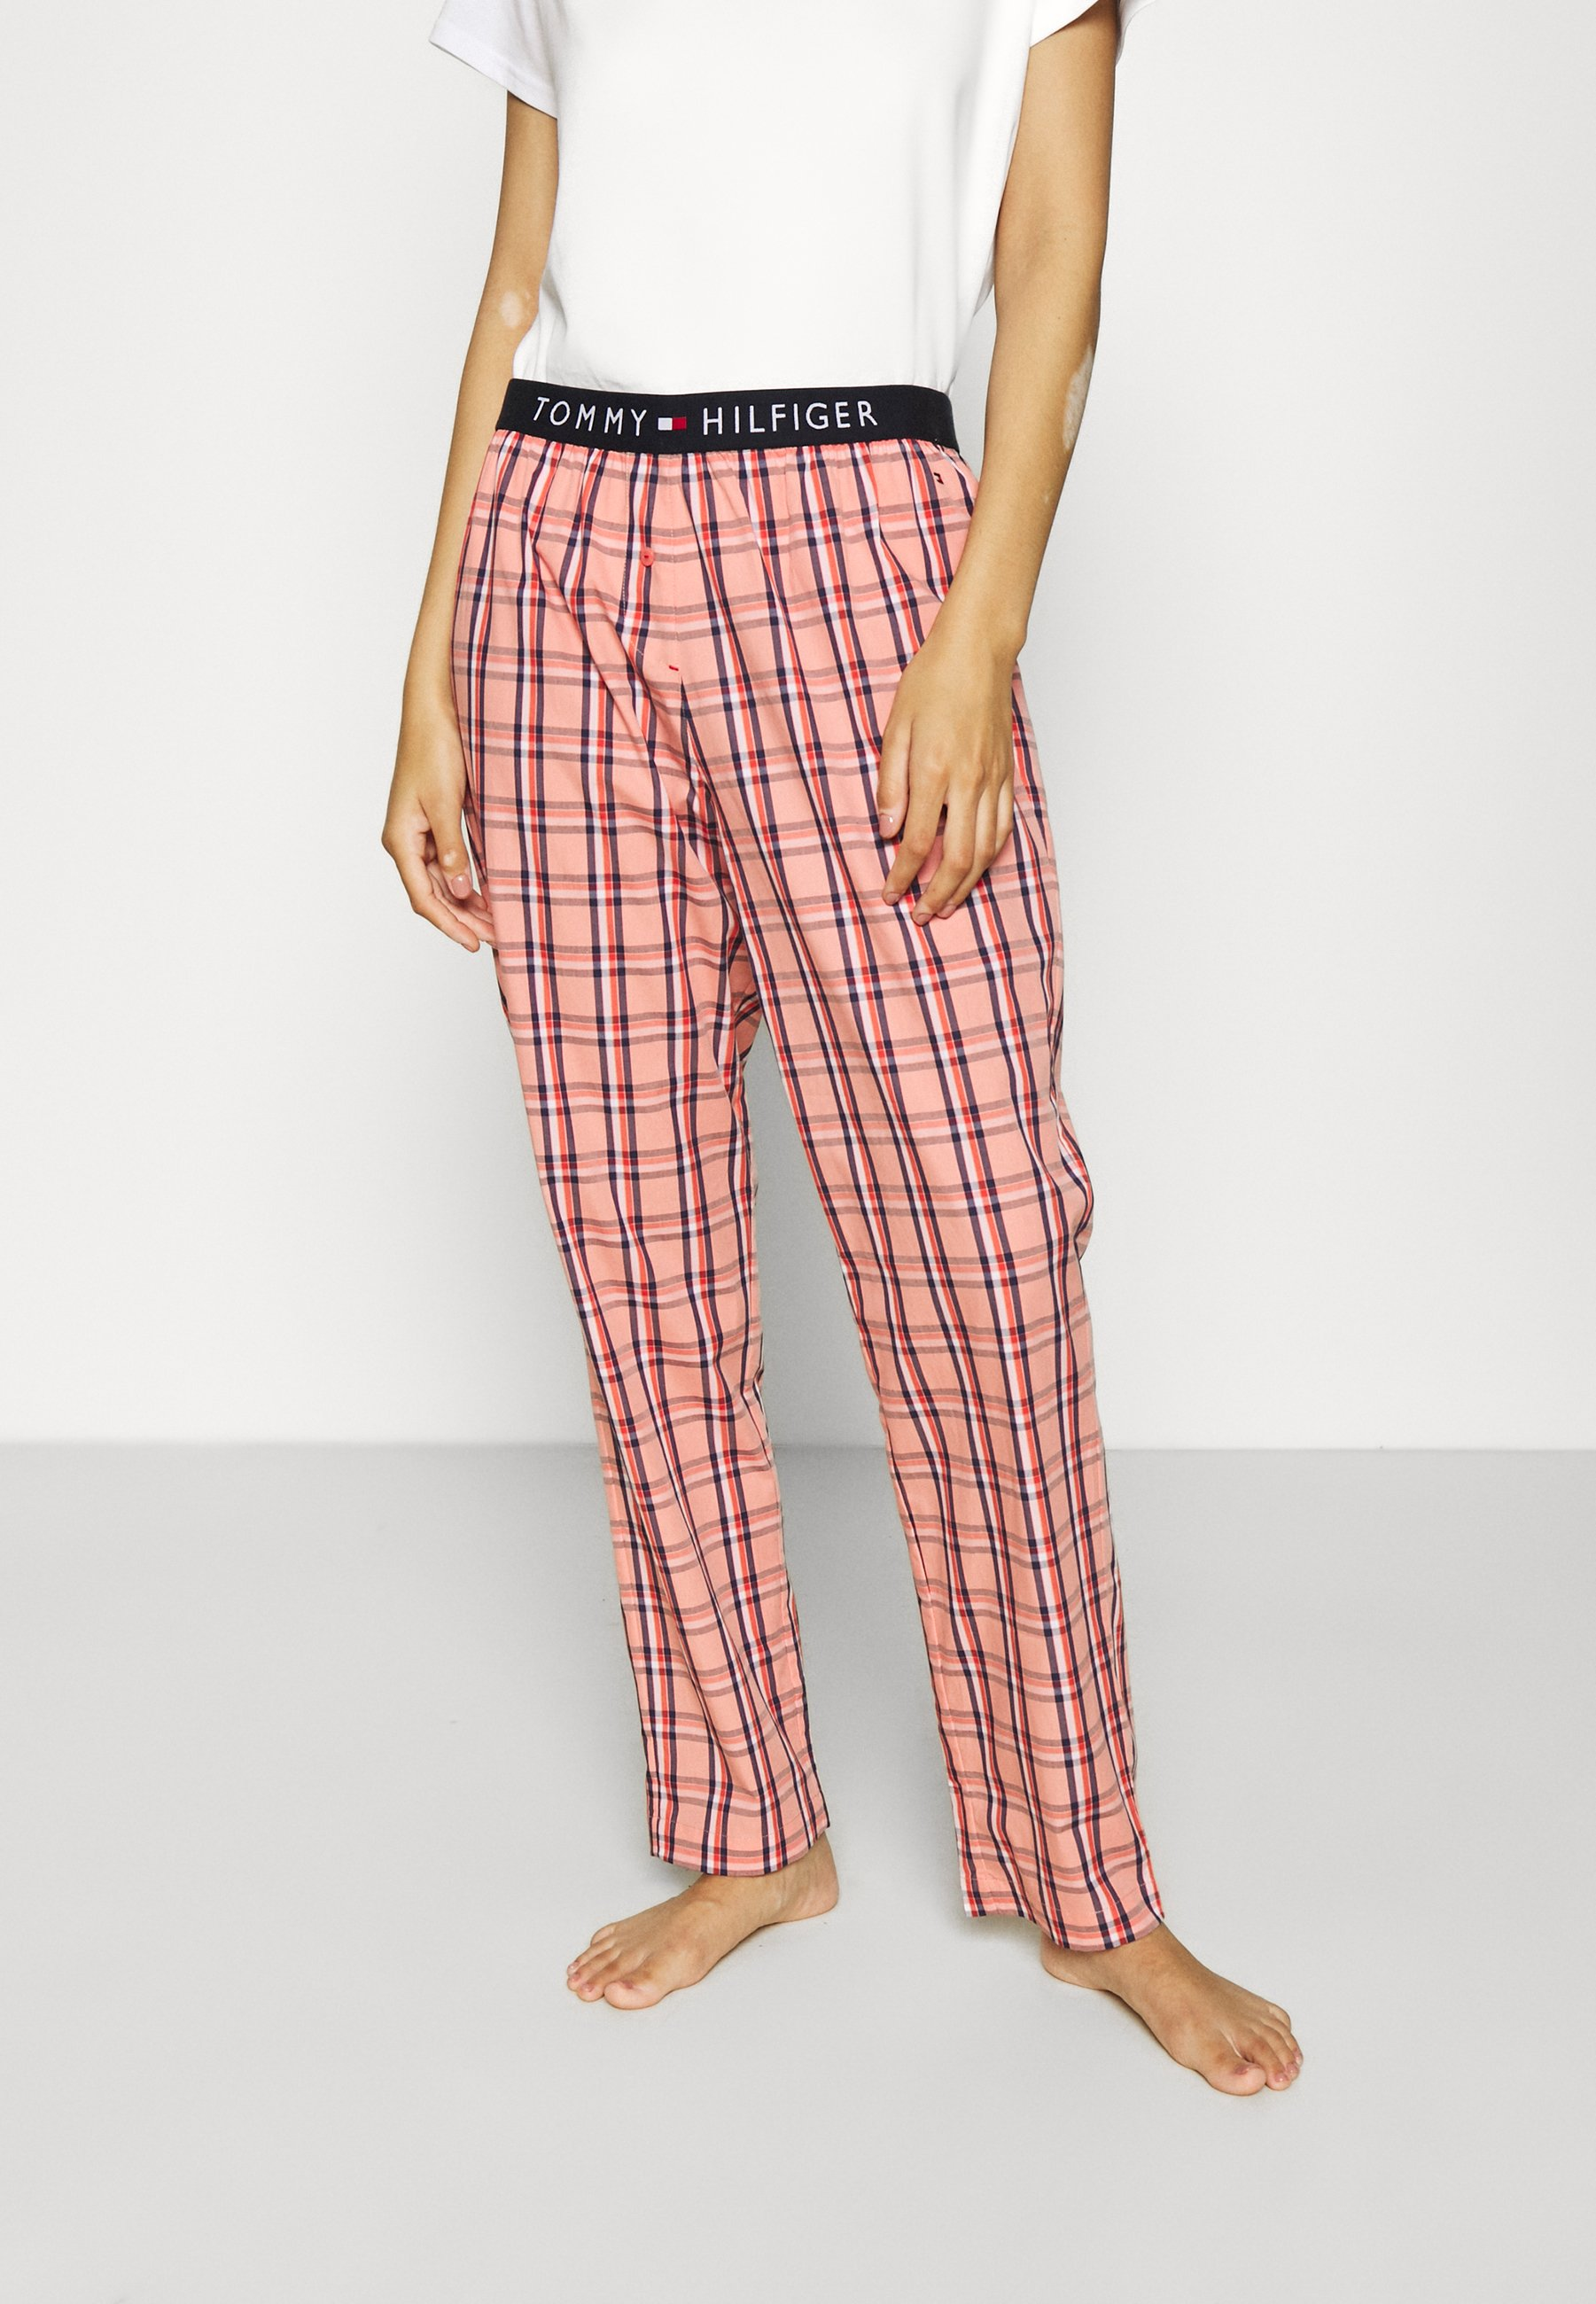 Damen ORIGINAL PANT - Nachtwäsche Hose - candy